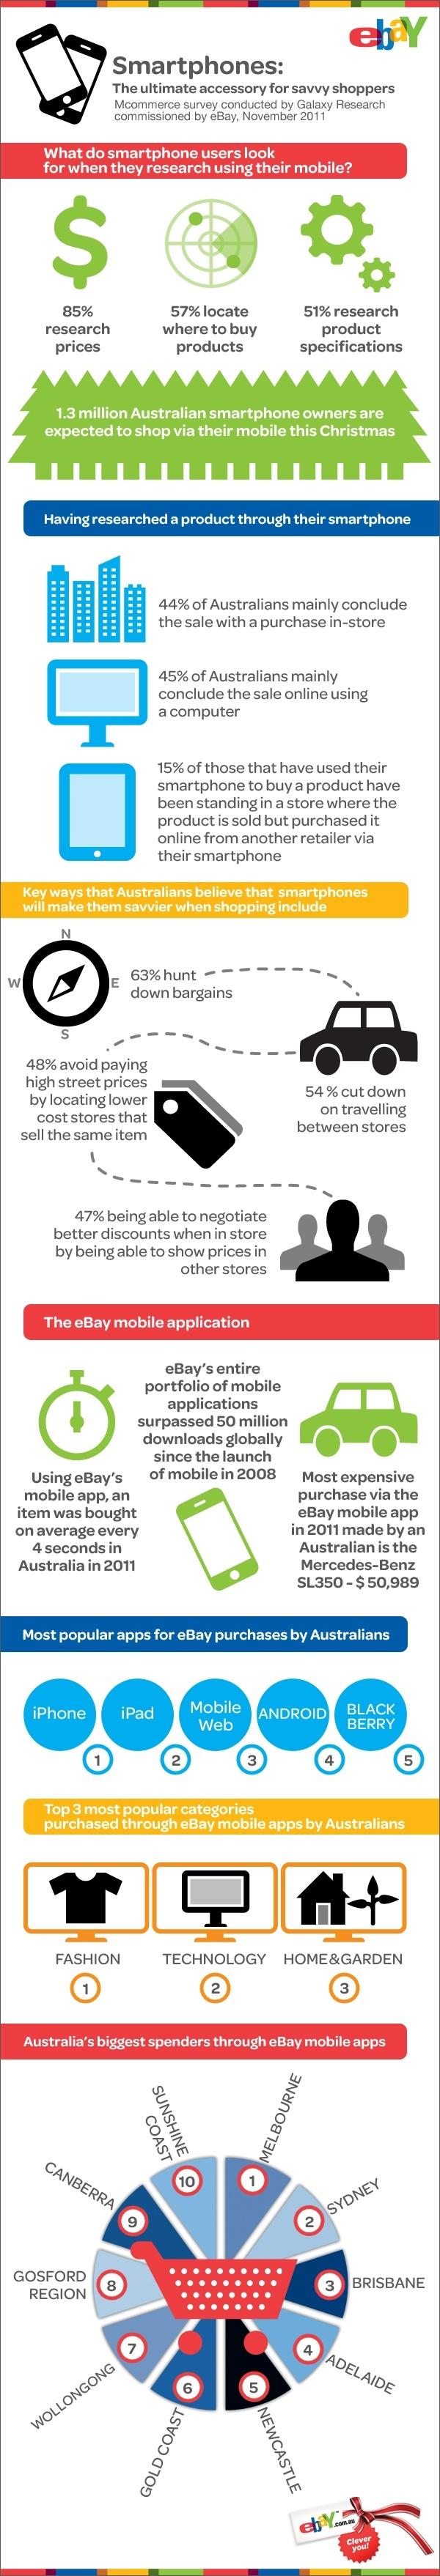 Ebay australia mobile ecommerce stats infographic